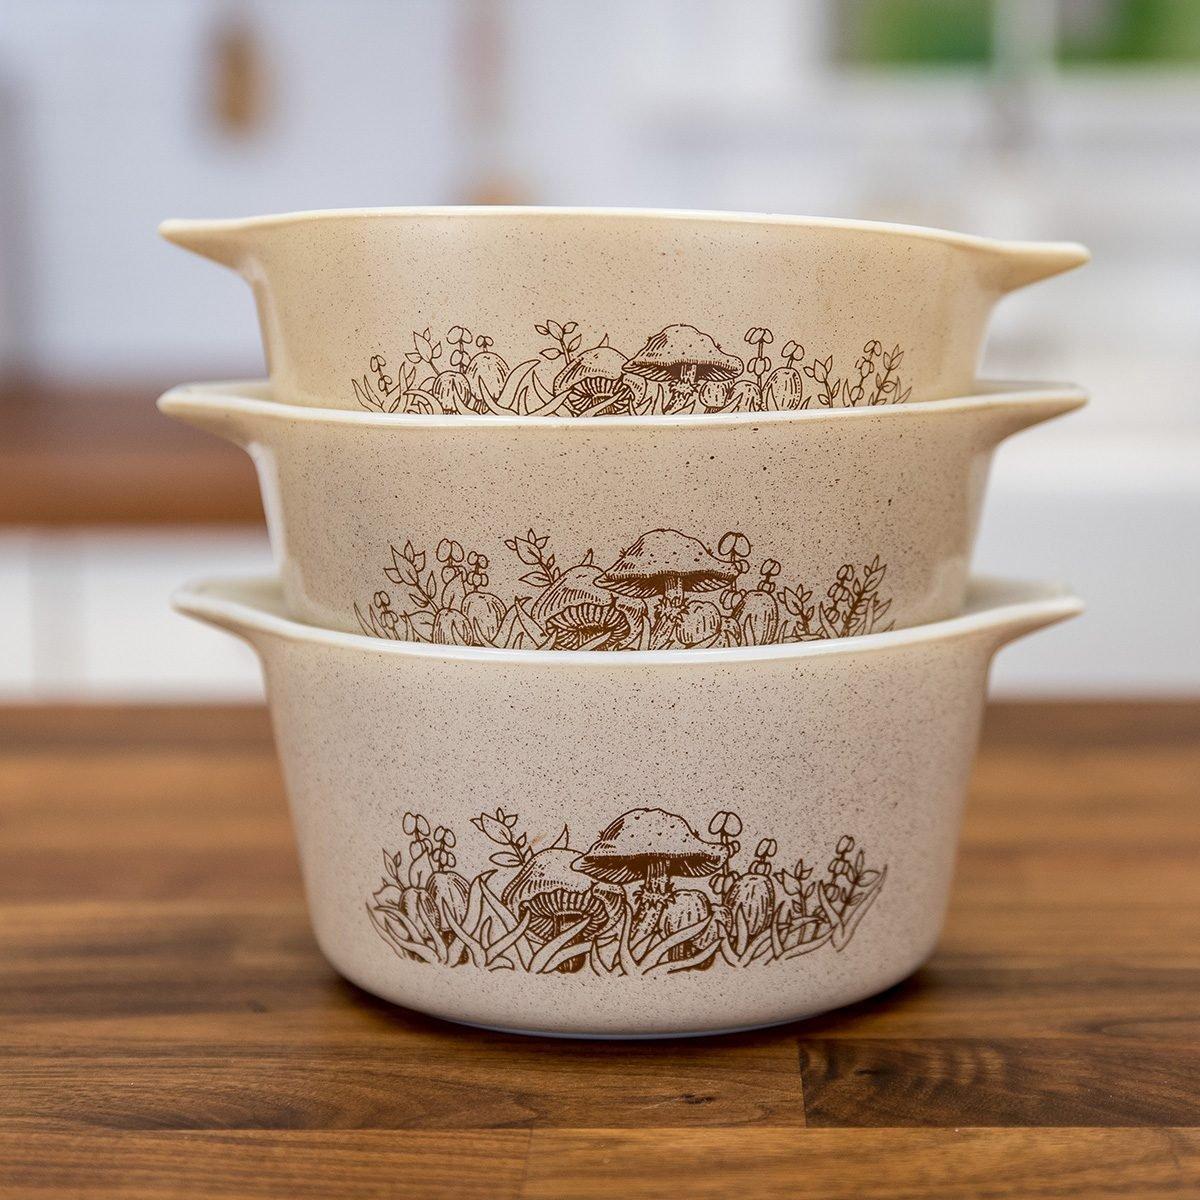 Vintage Pyrex bowls in Forest Fancies print